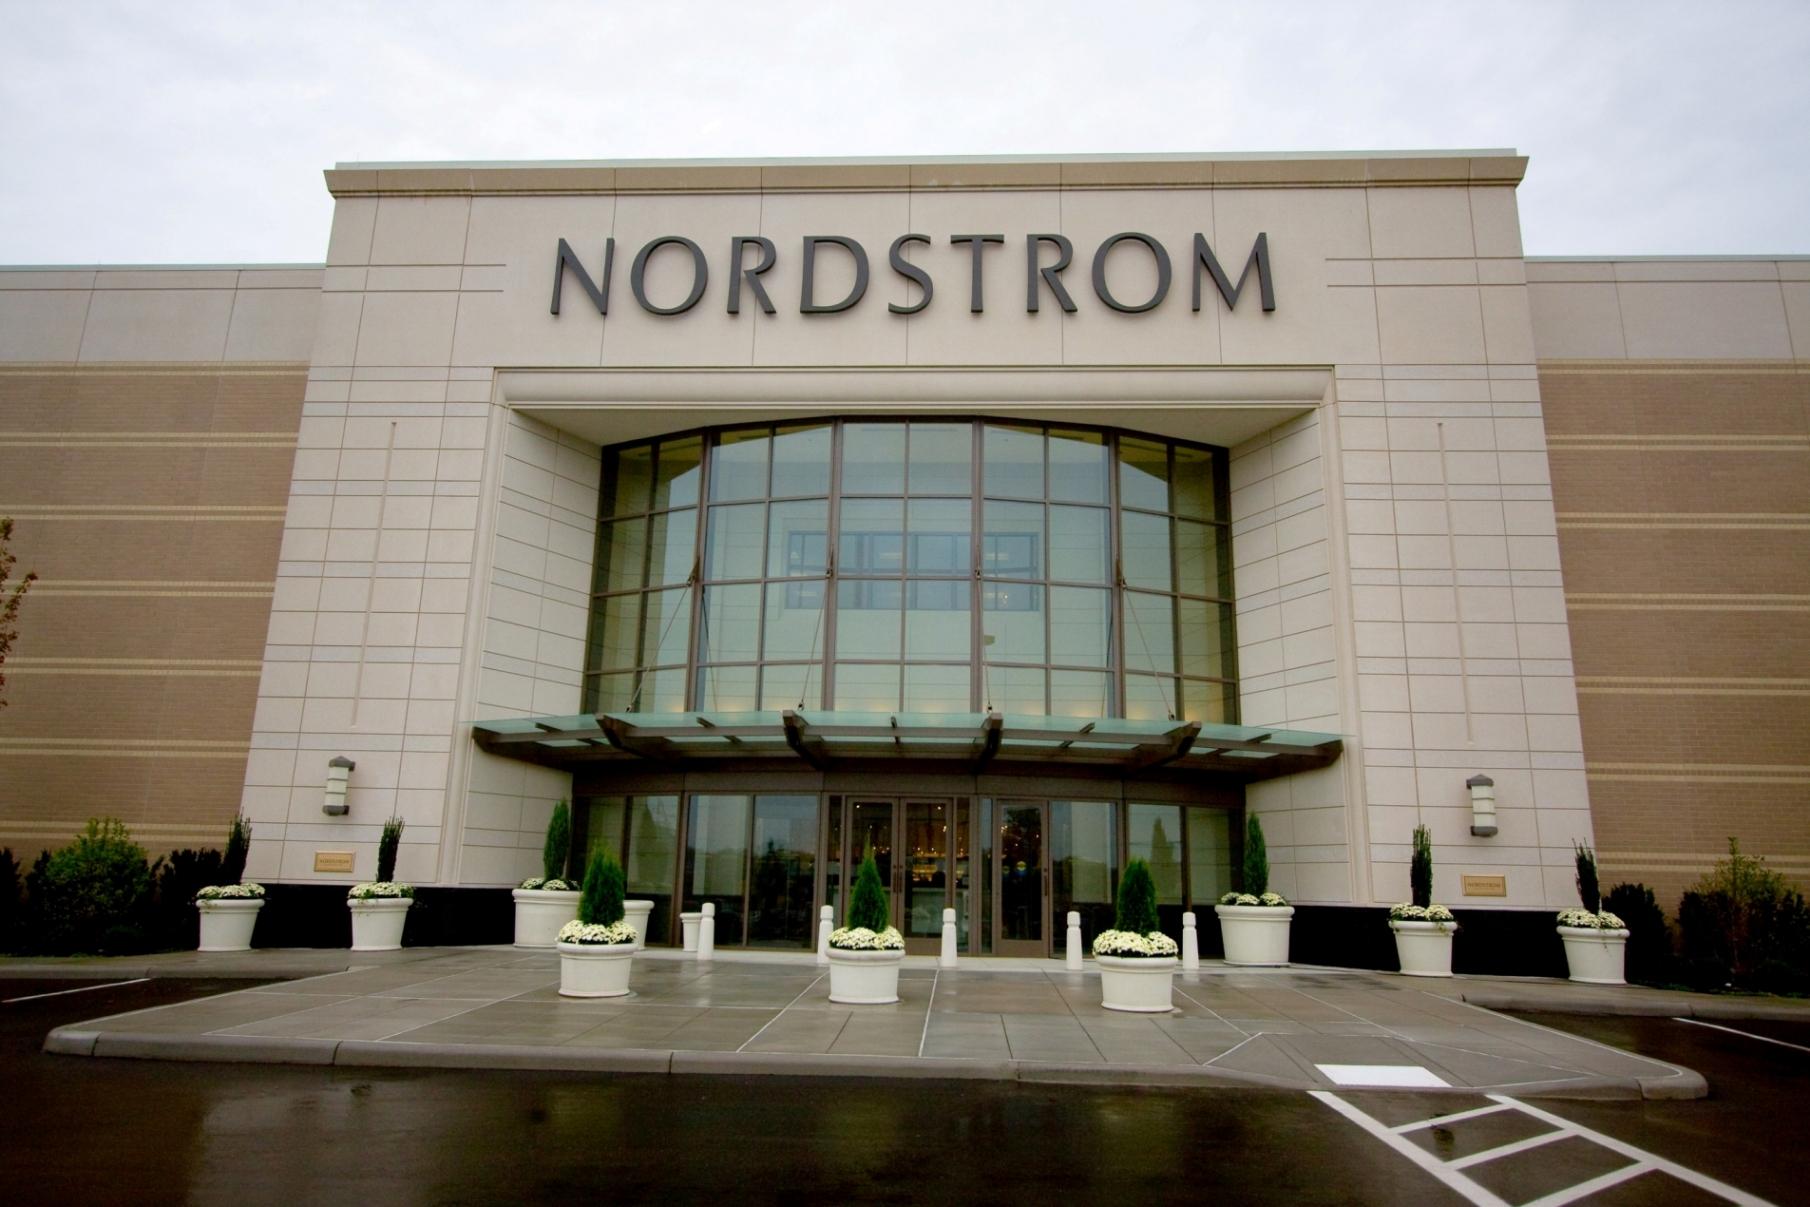 Nordstrom 4Q Profit Drops on Holiday Discounts